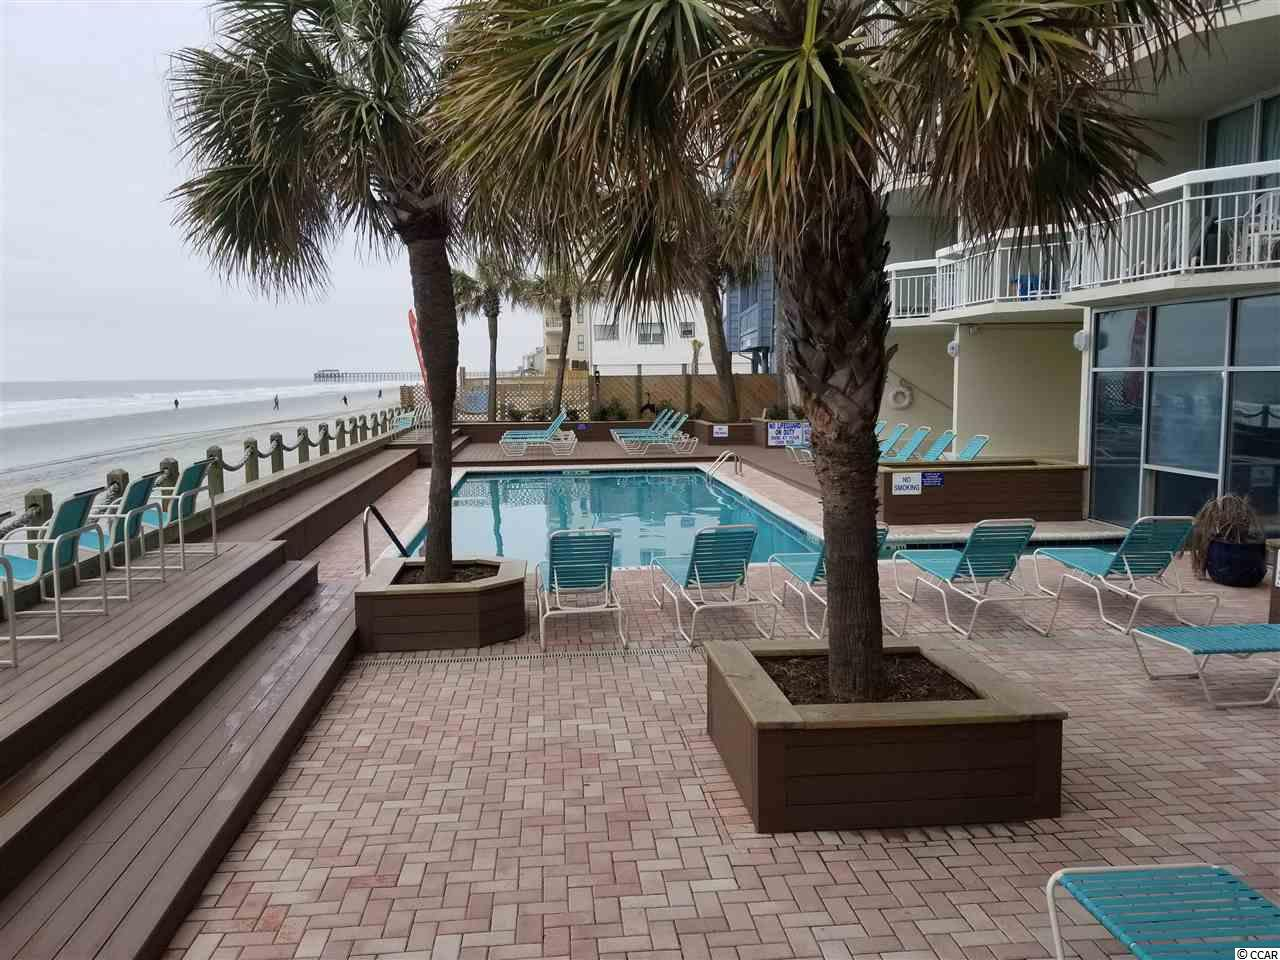 Mls 1806503 1012 N Waccamaw Dr Unit 306 Garden City Beach Waters Edge Resort Property For